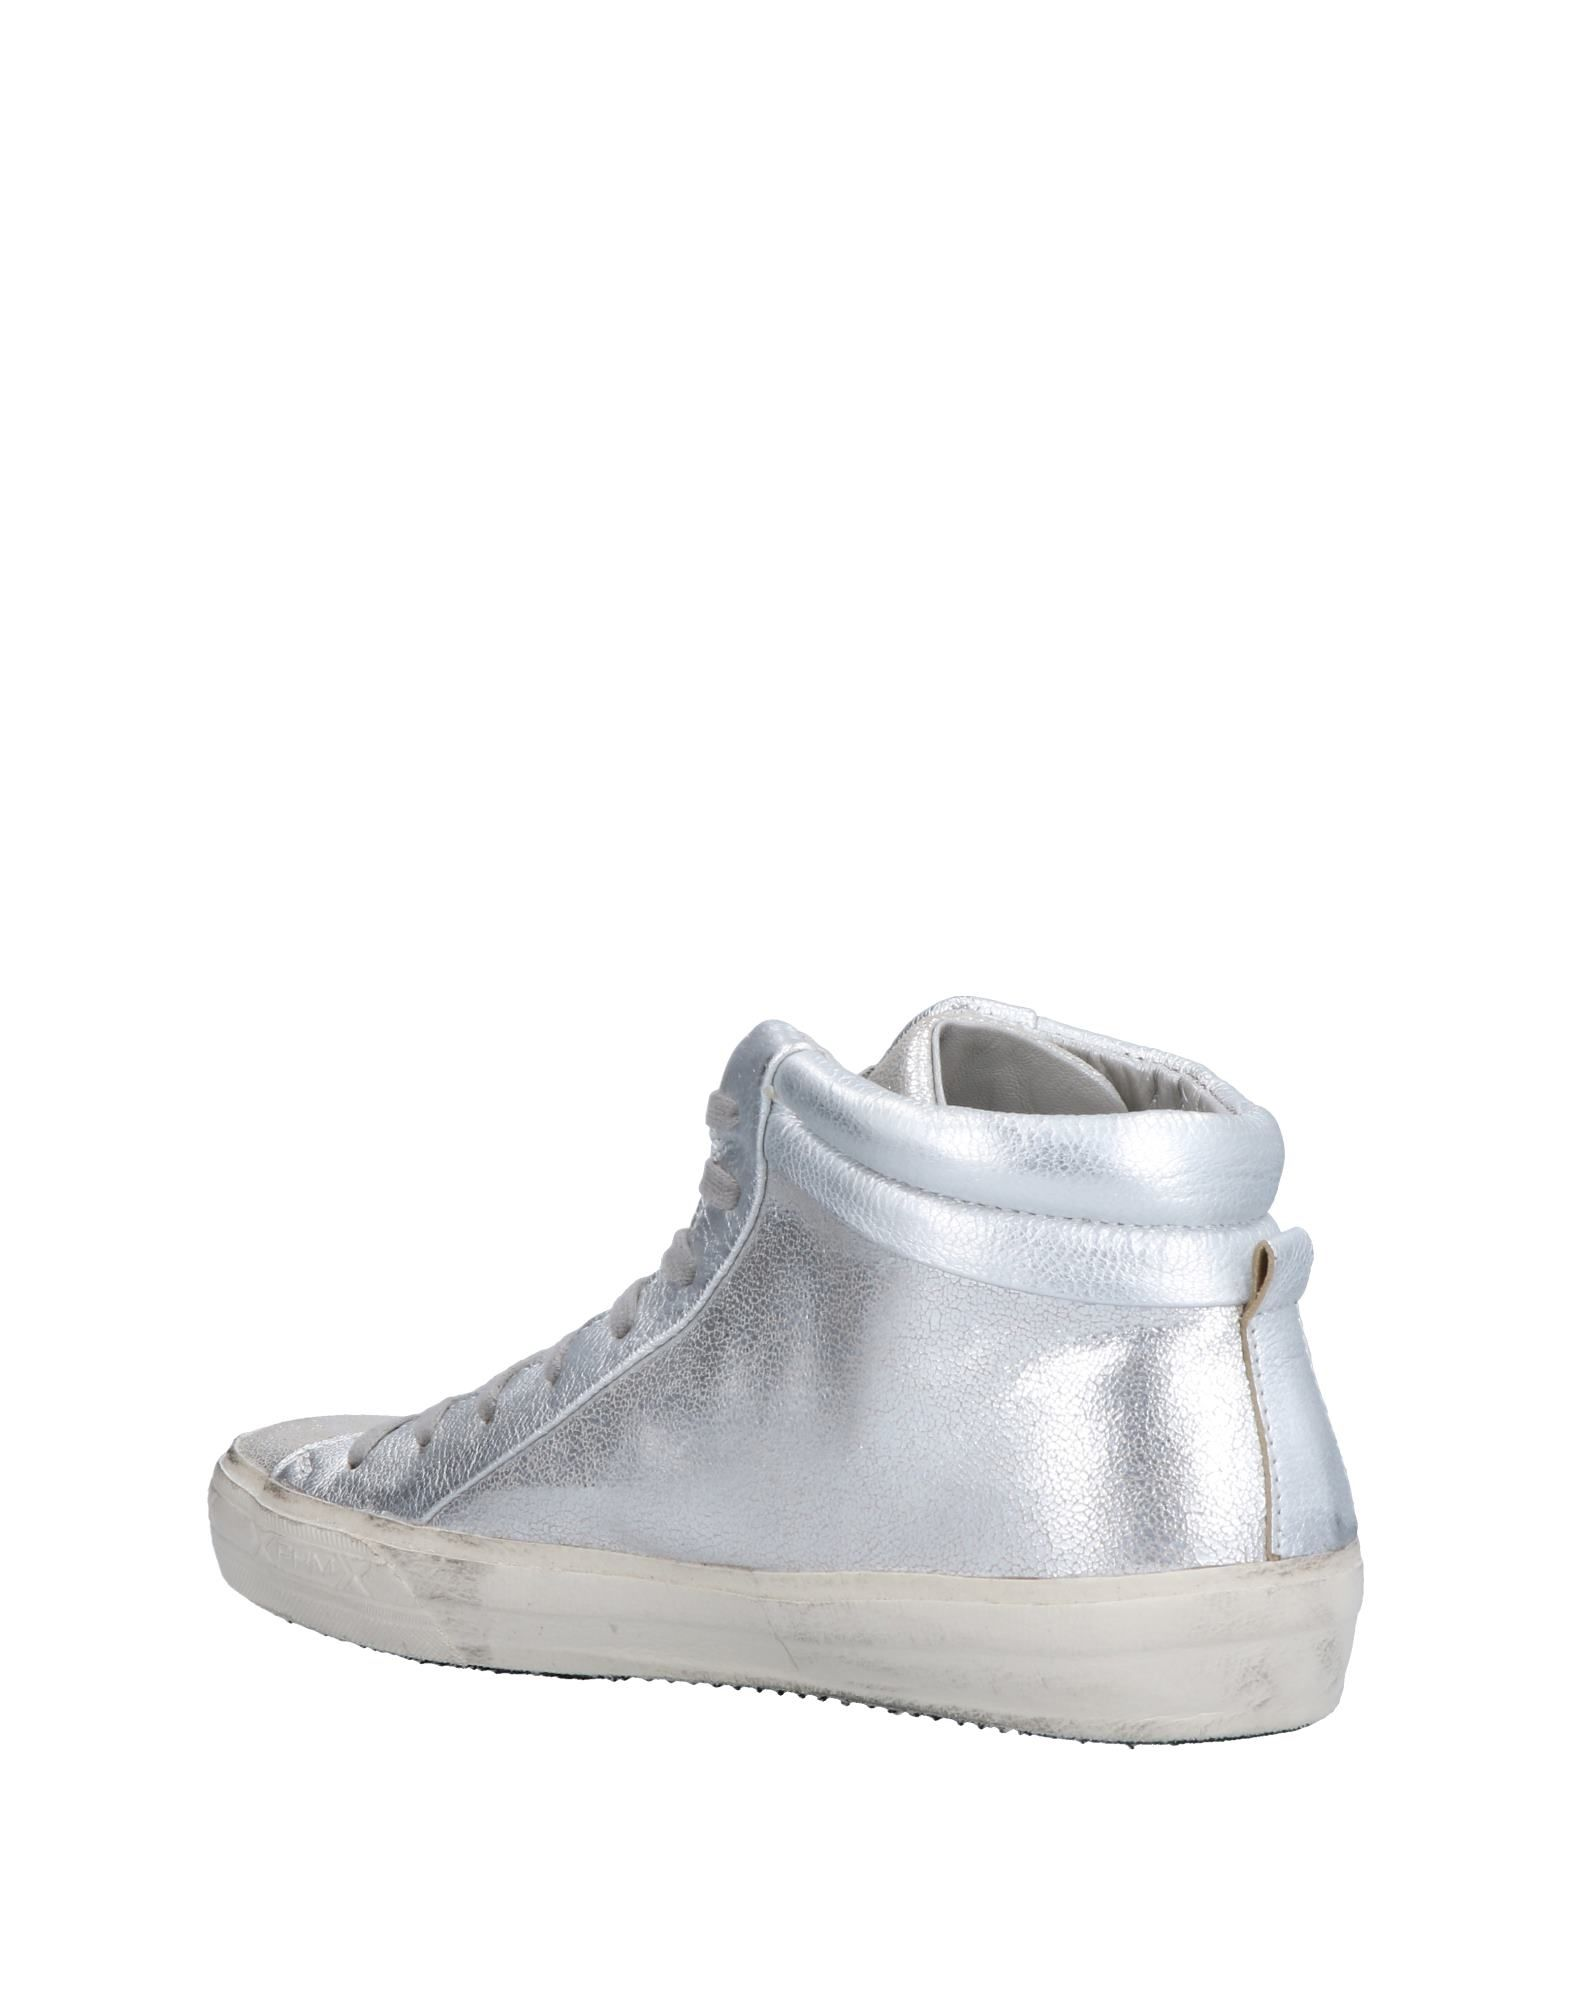 Stilvolle Sneakers billige Schuhe Philippe Model Sneakers Stilvolle Damen  11503054KJ 18cd56